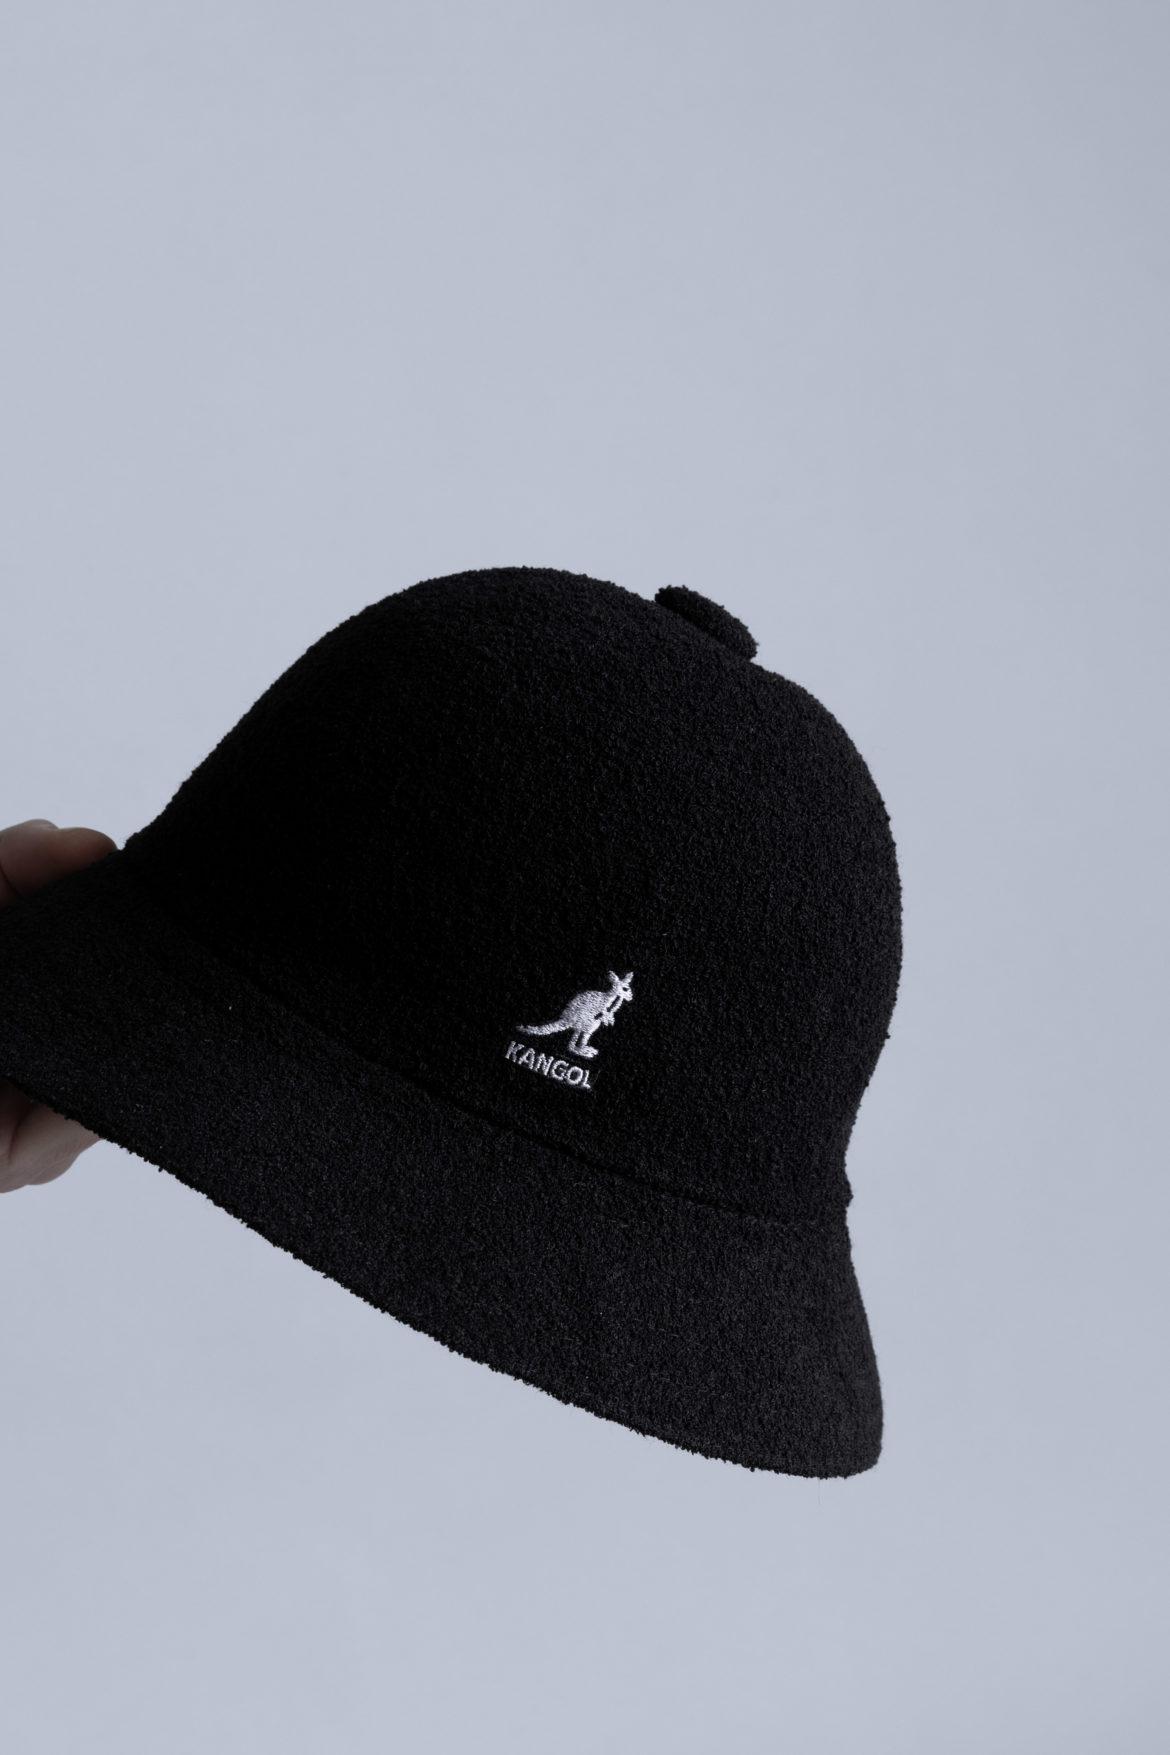 Kangol Bermuda Casual Bucket Hat Black Style Centrevillestore